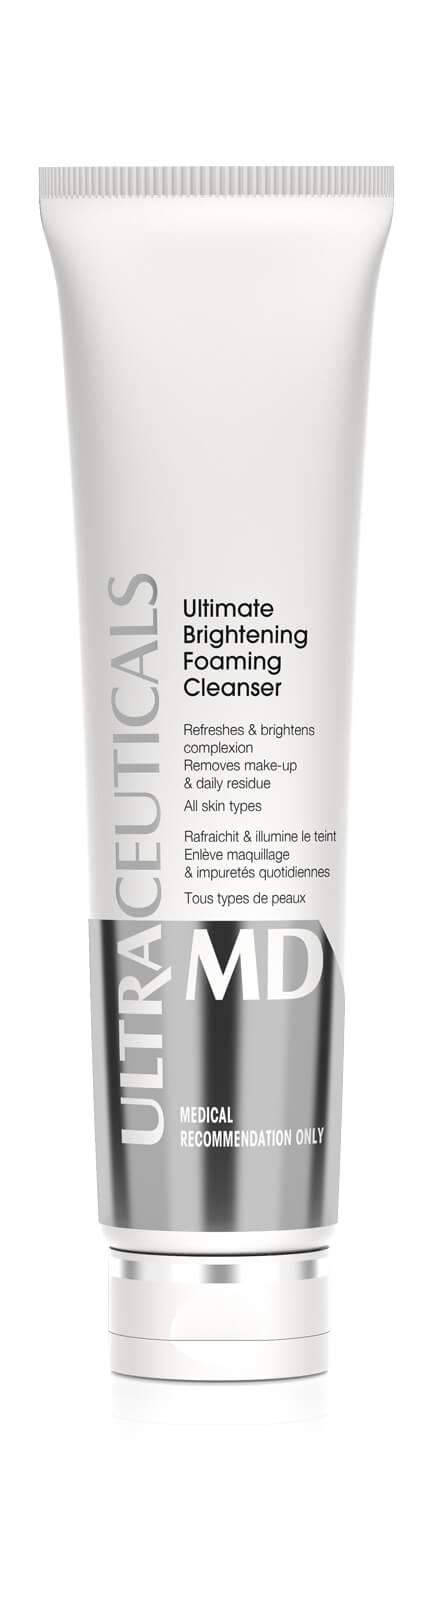 Ultramd Ultimate brightening foaming cleaner online